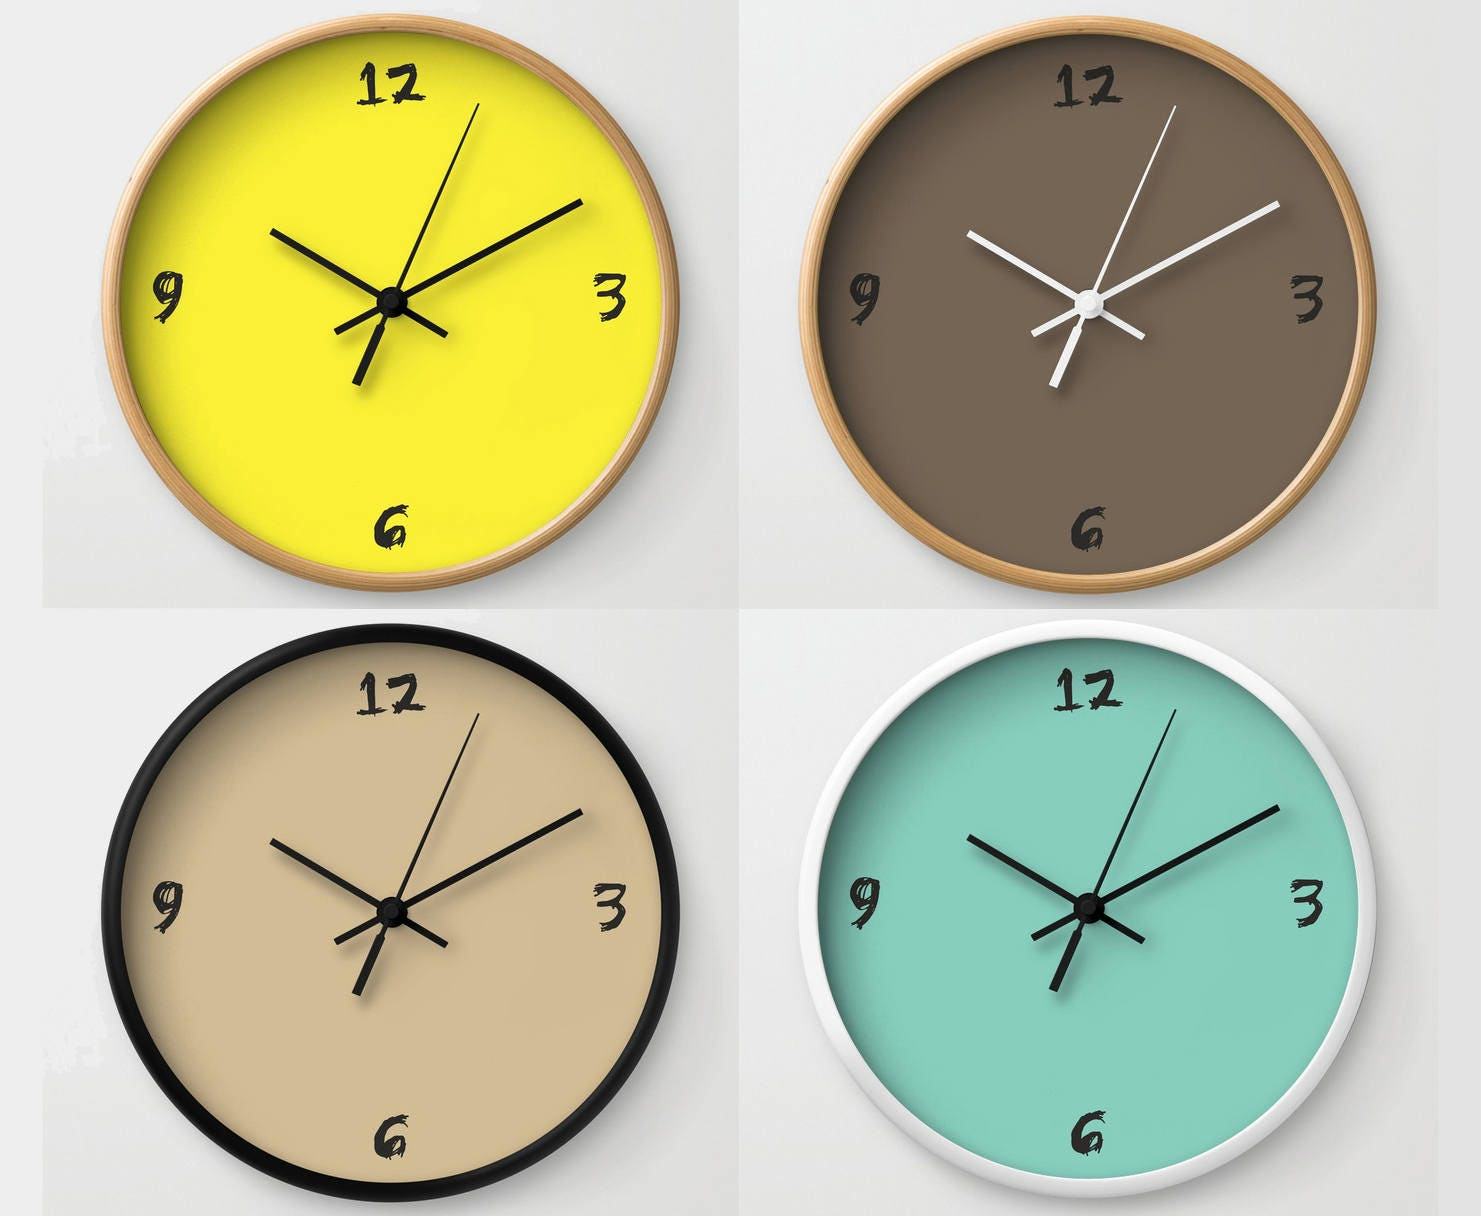 Zahlen Wanduhr Minimal Design Wanduhr moderne Uhr moderne